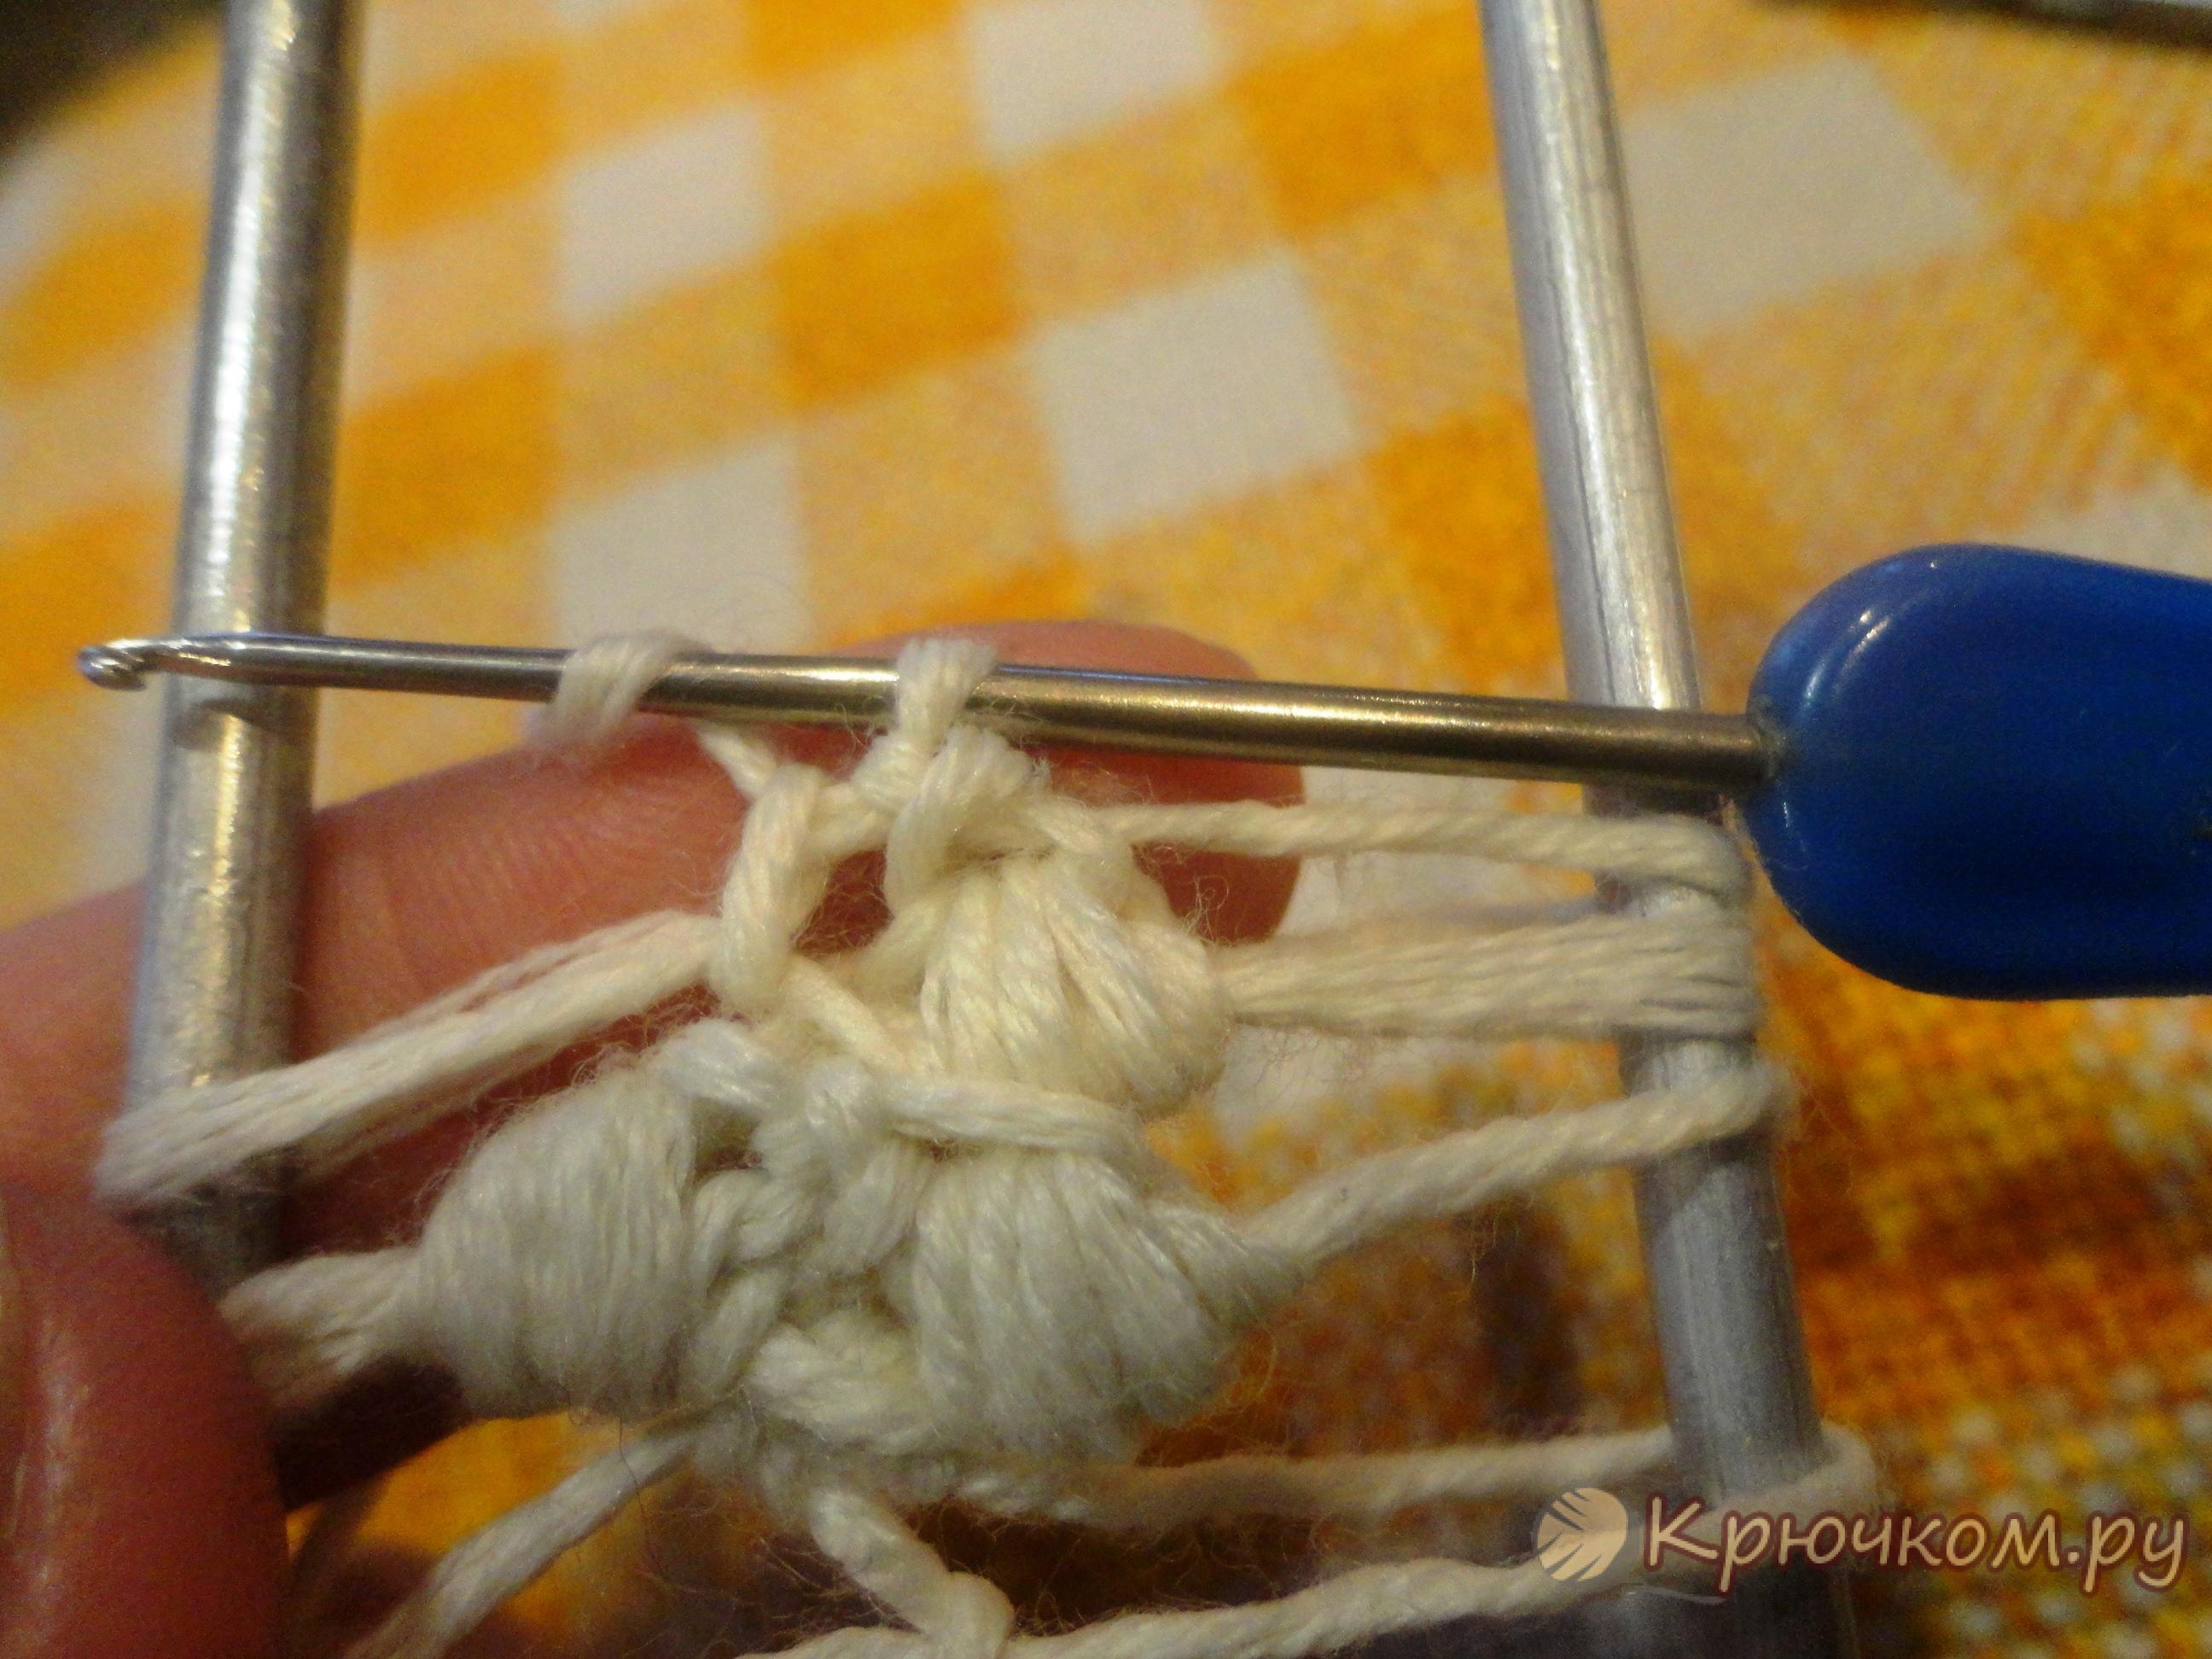 Вилка для вязания крючком своими руками